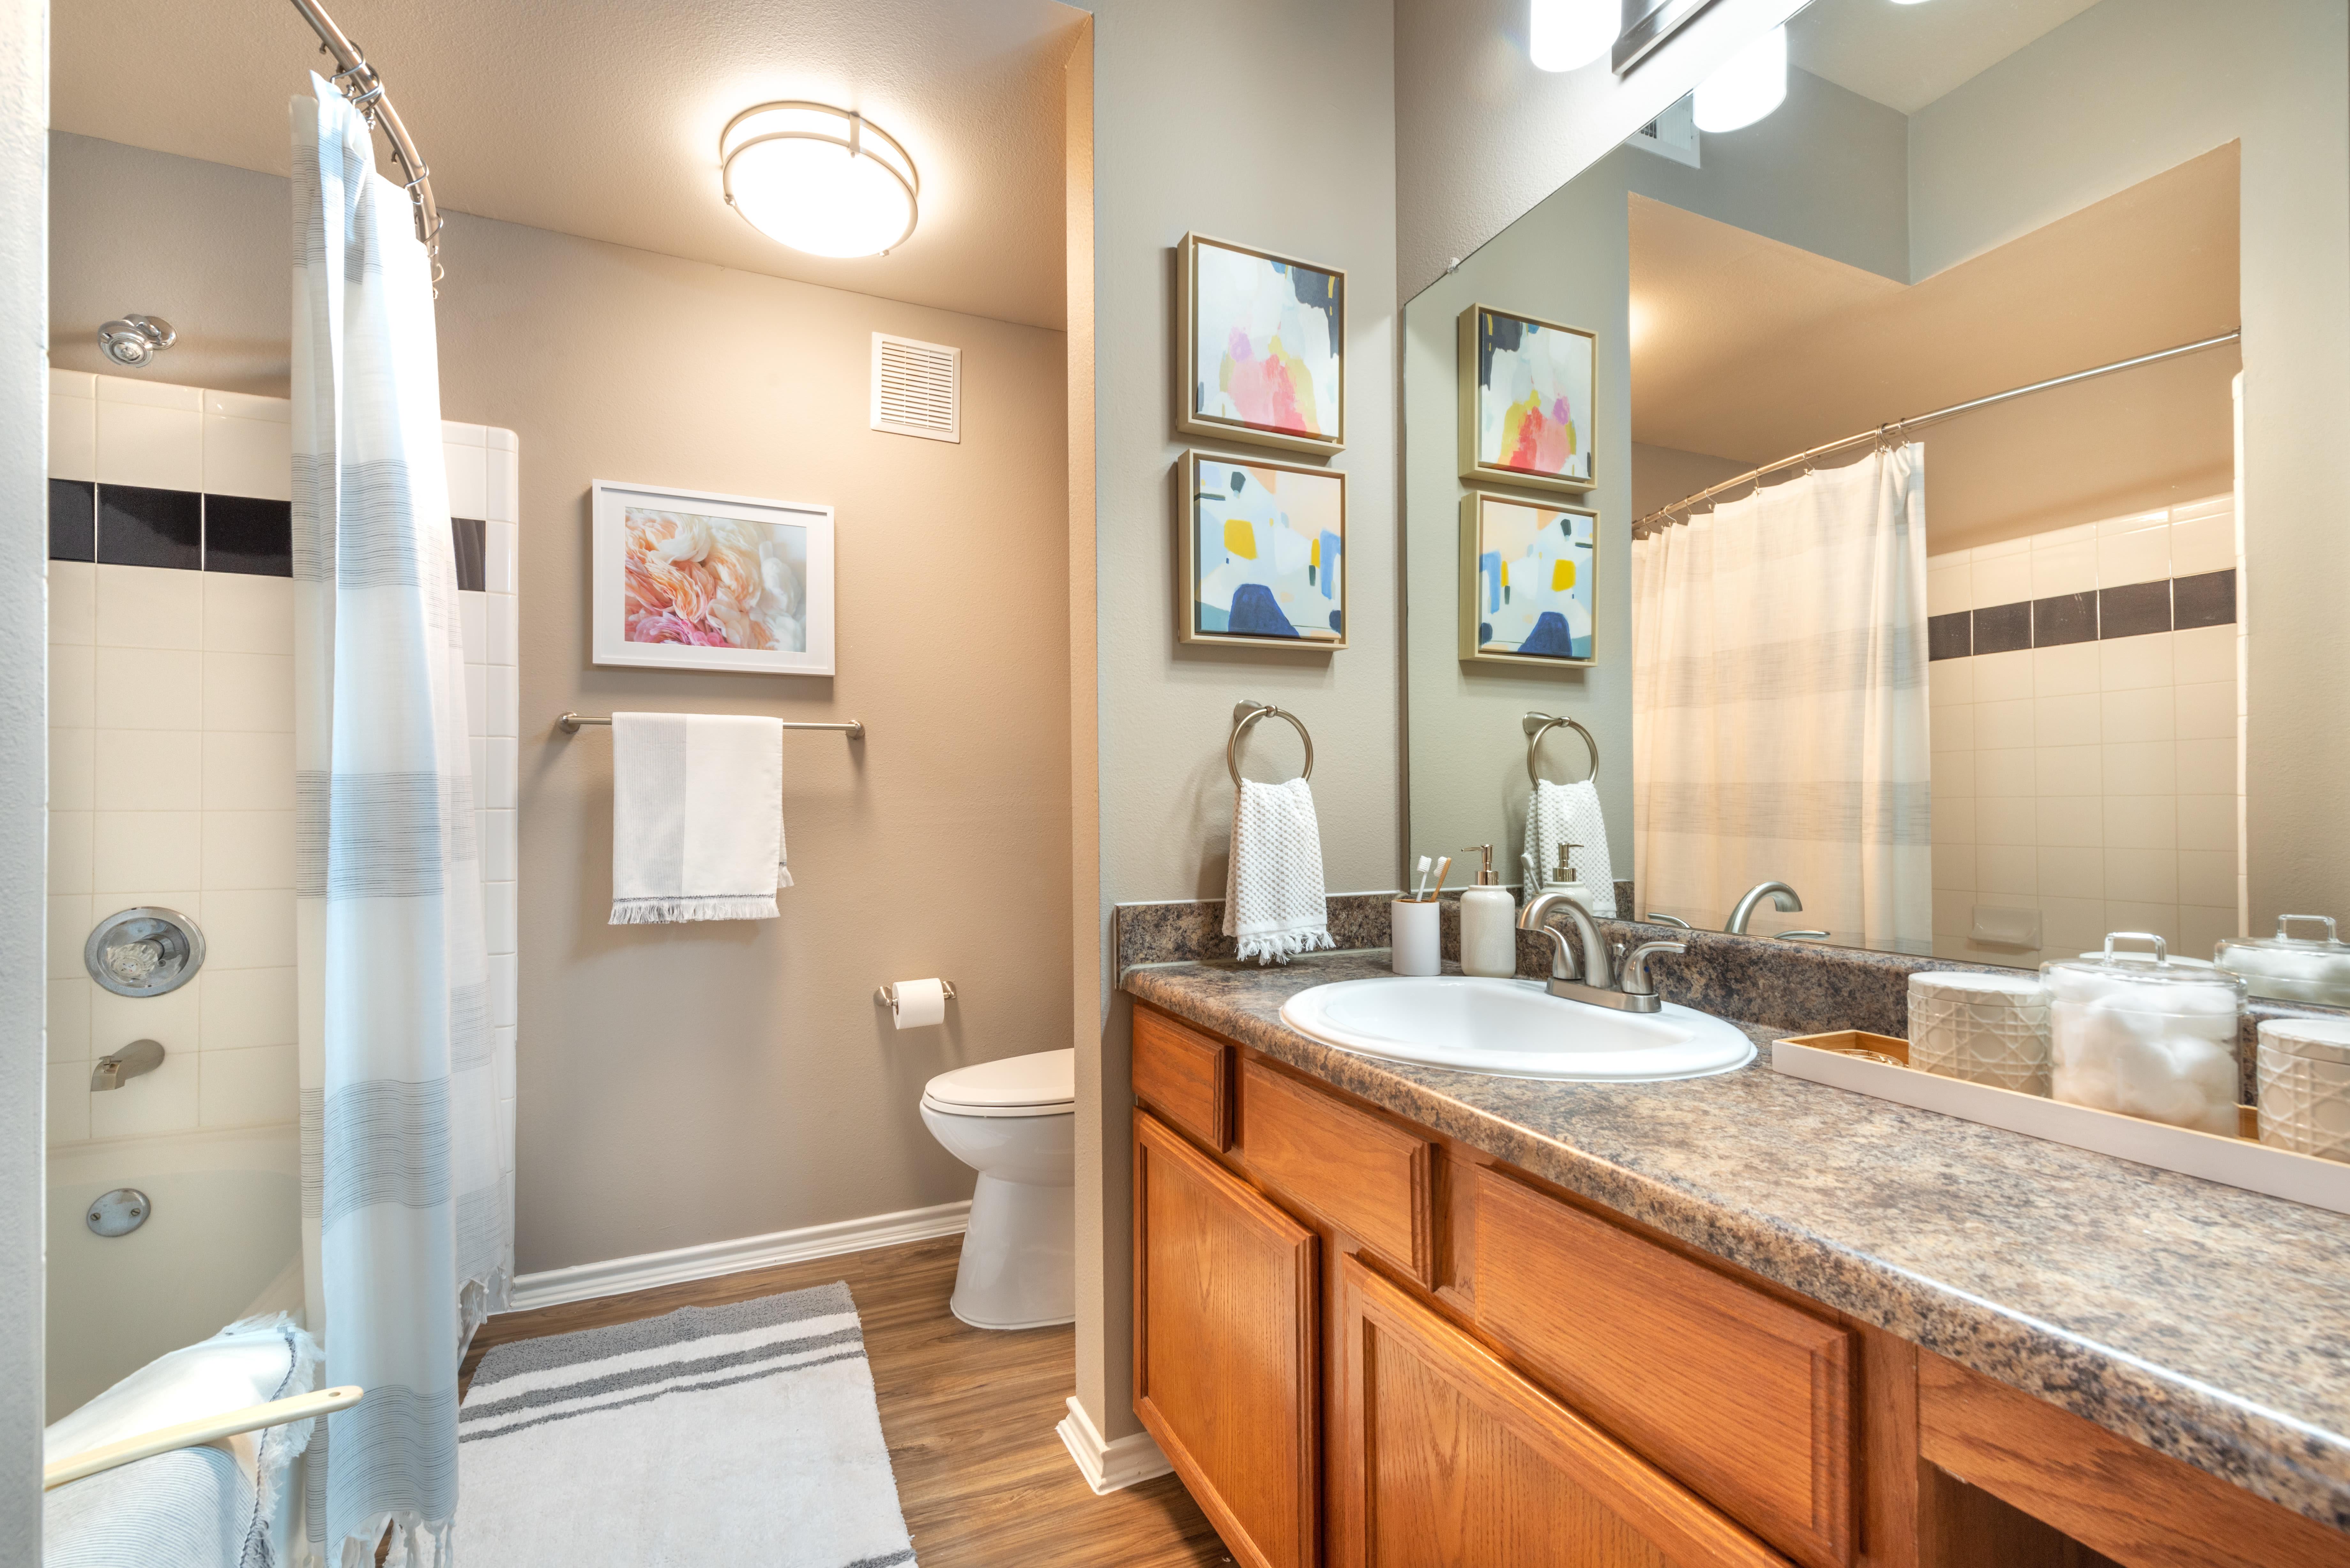 Granite countertop in a model home's bathroom at Olympus Team Ranch in Benbrook, Texas